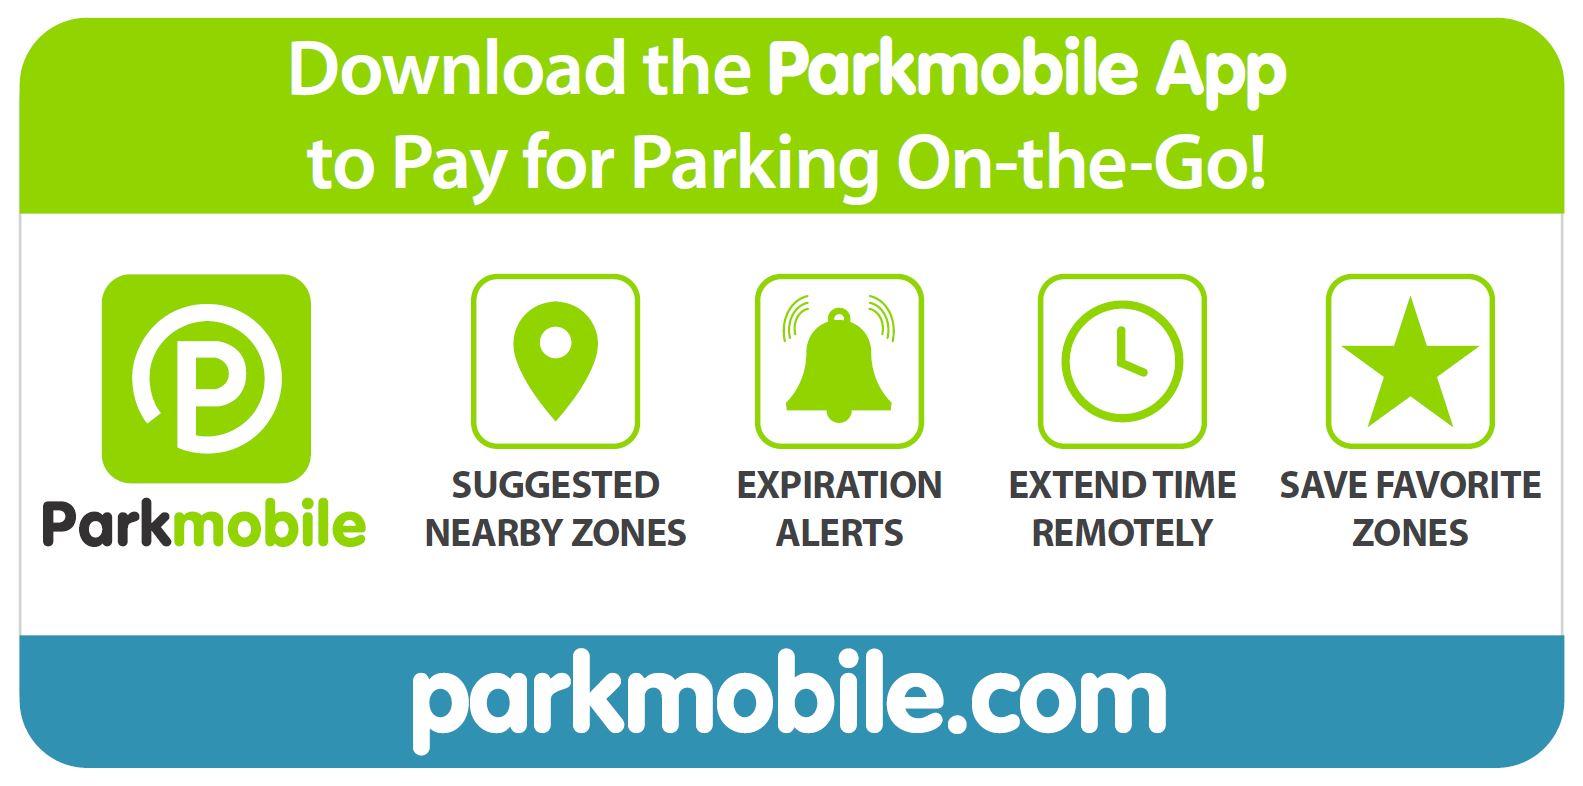 Parkmobile infographic, app